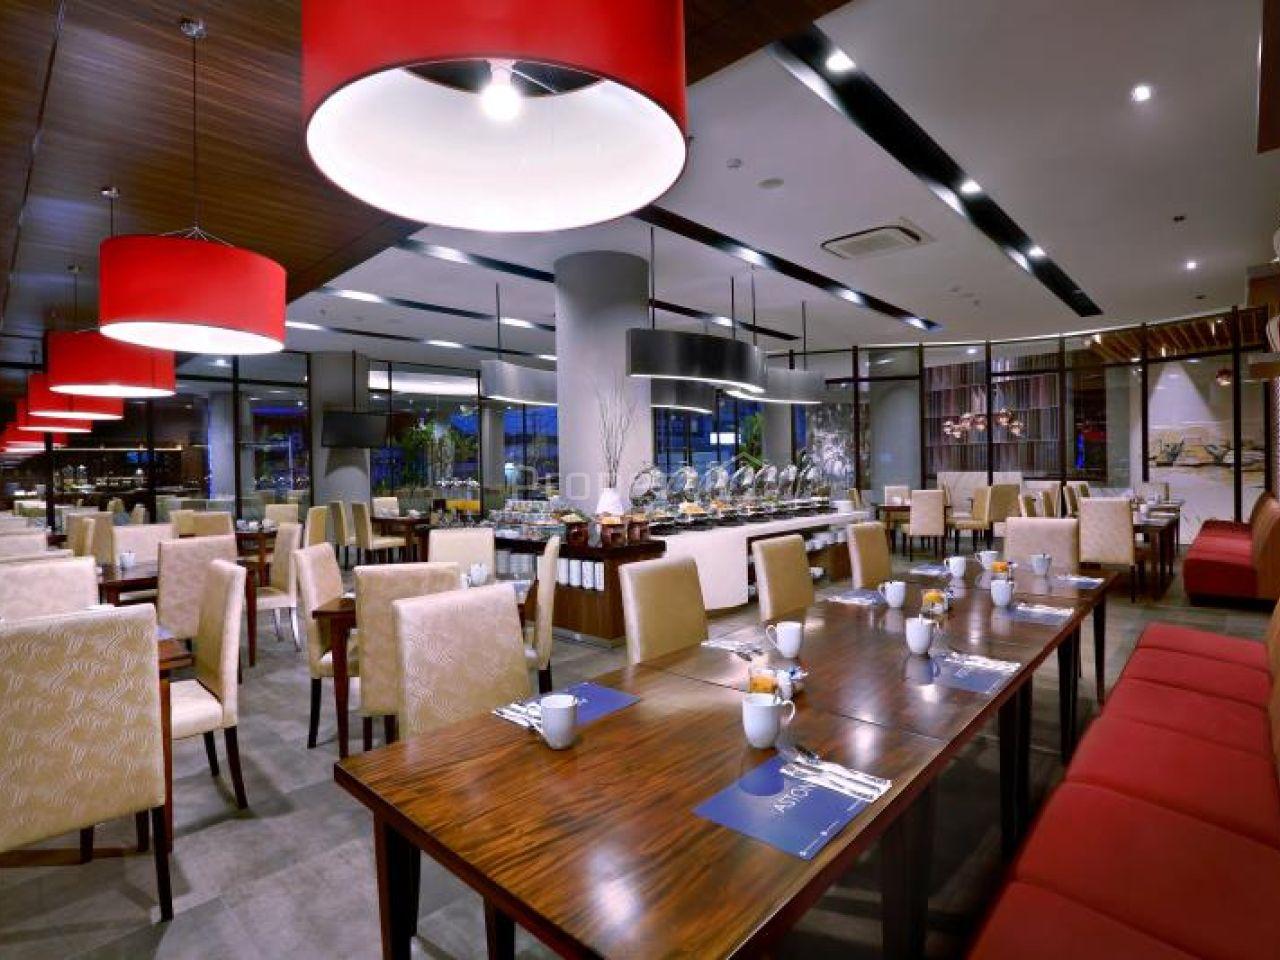 Hotel Bintang 4 di Kota Mataram, Nusa Tenggara Barat